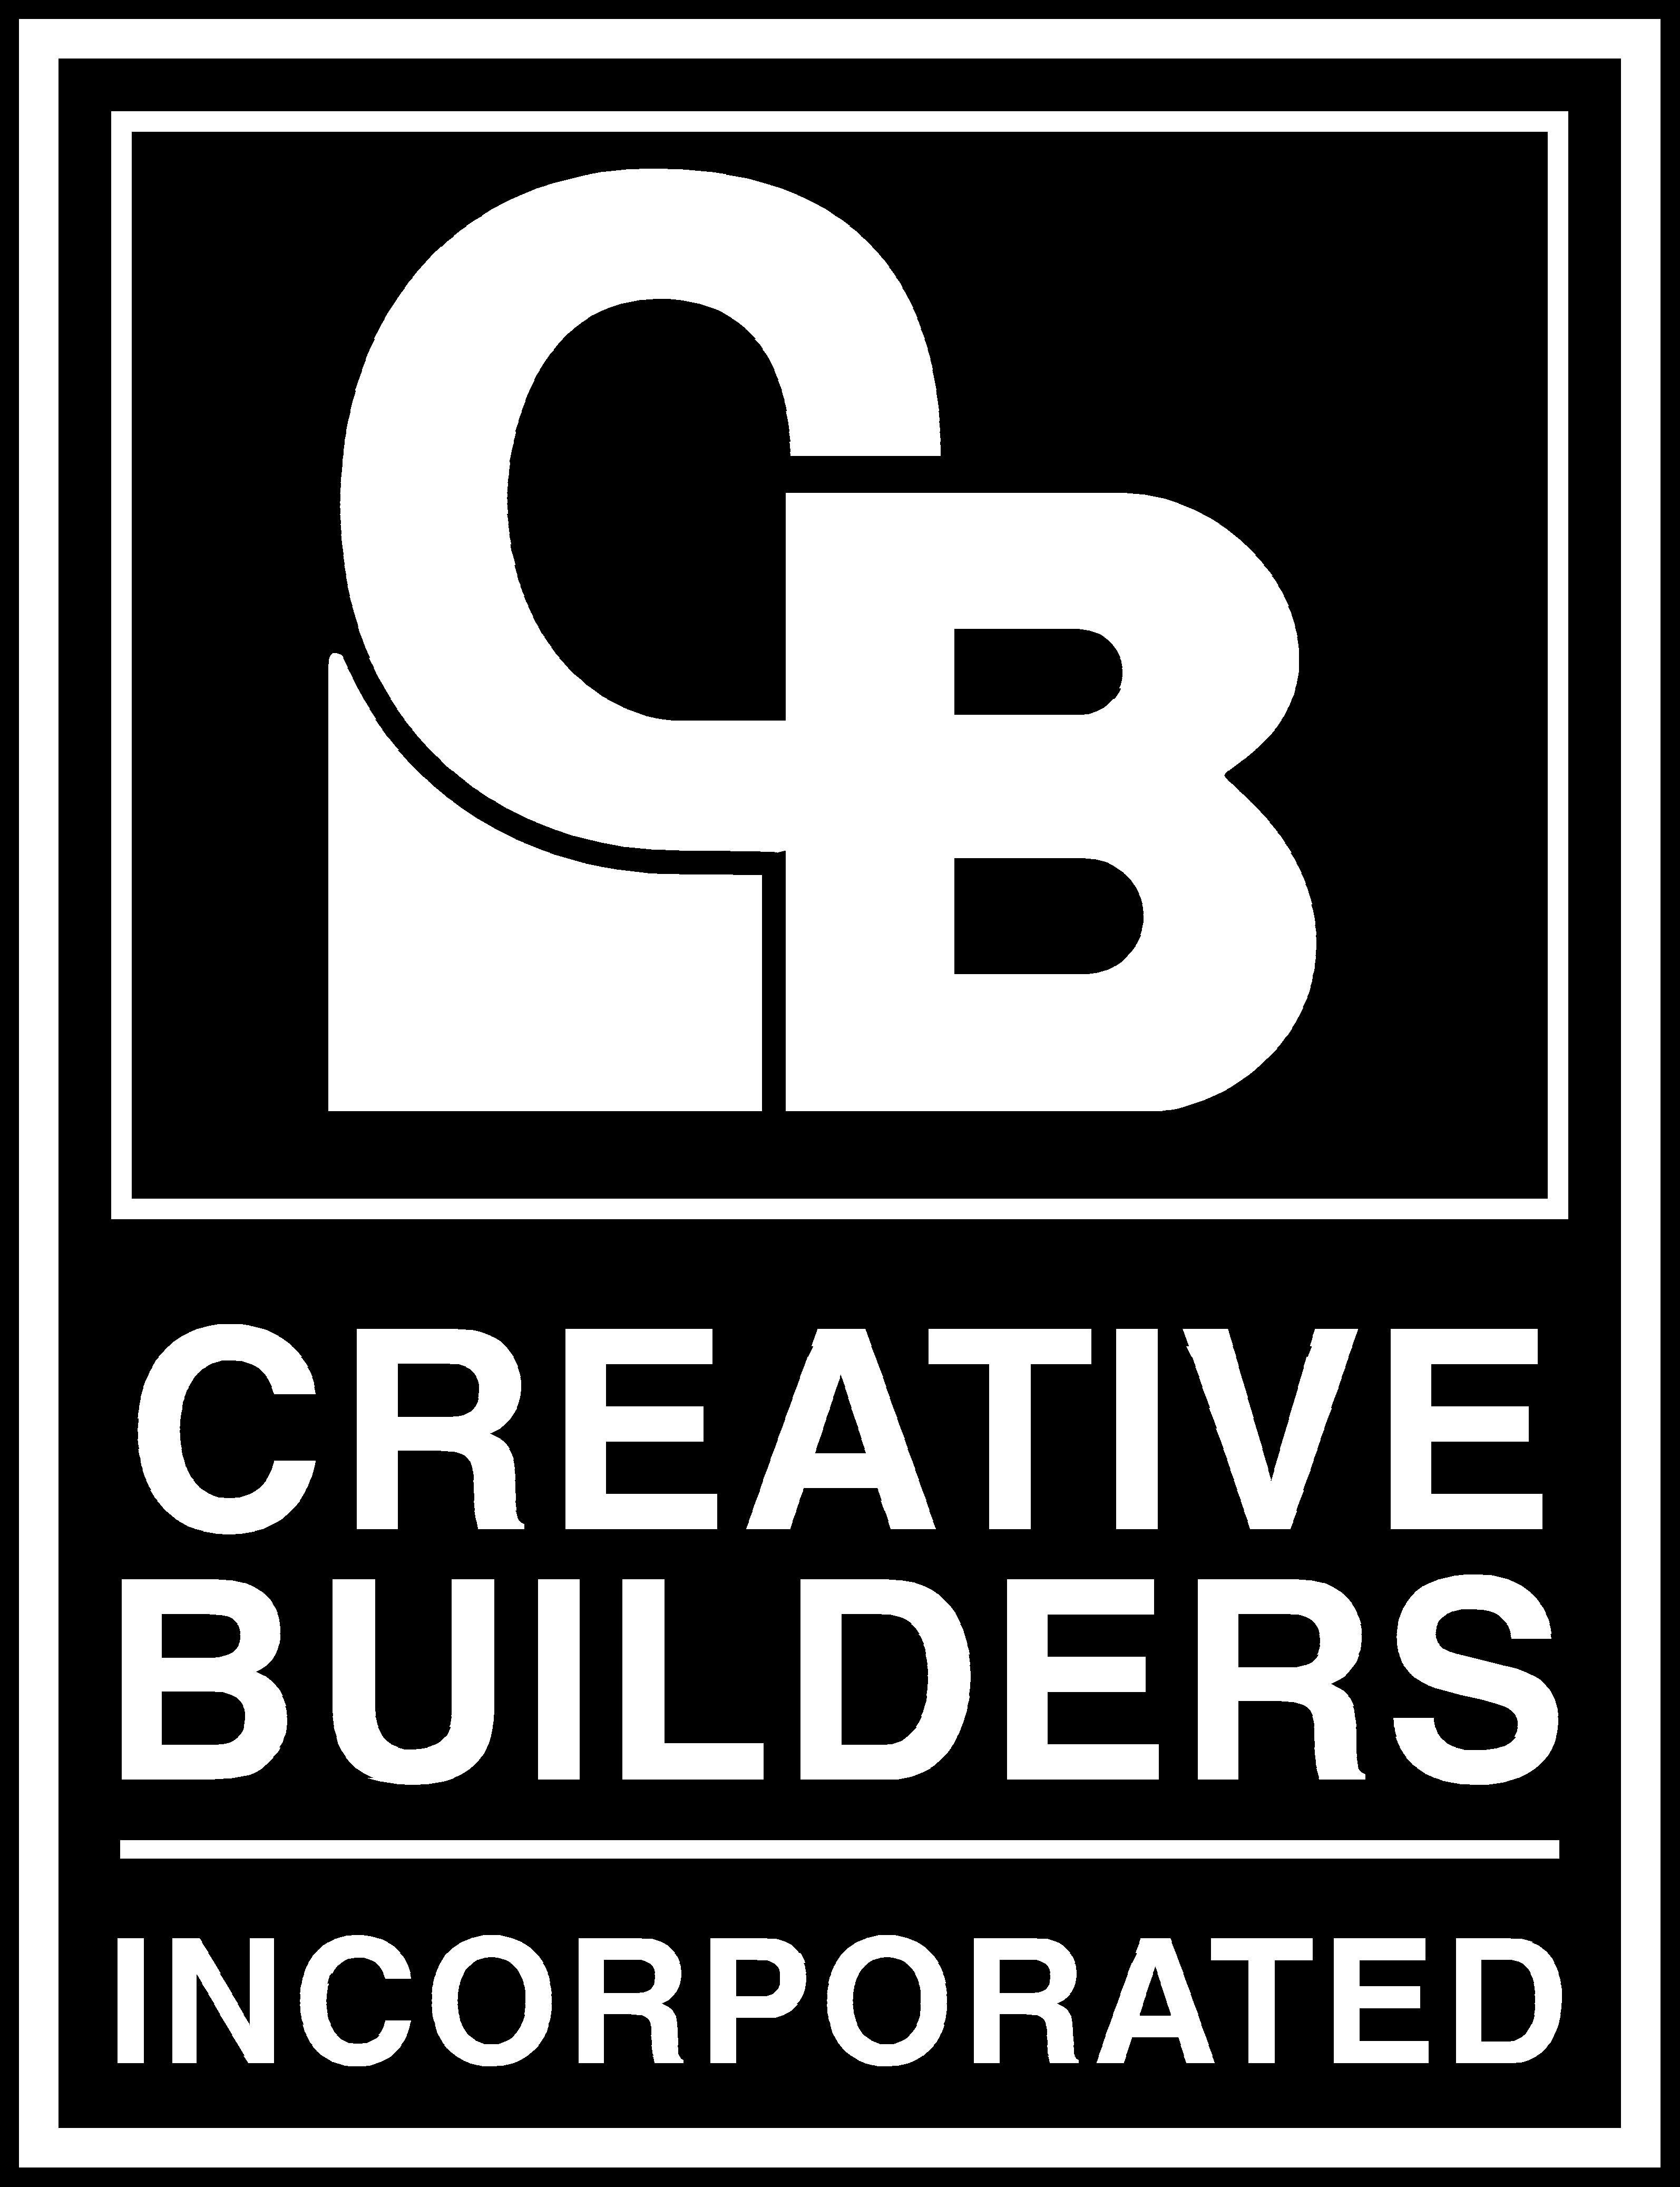 Creative Builders, Inc. logo